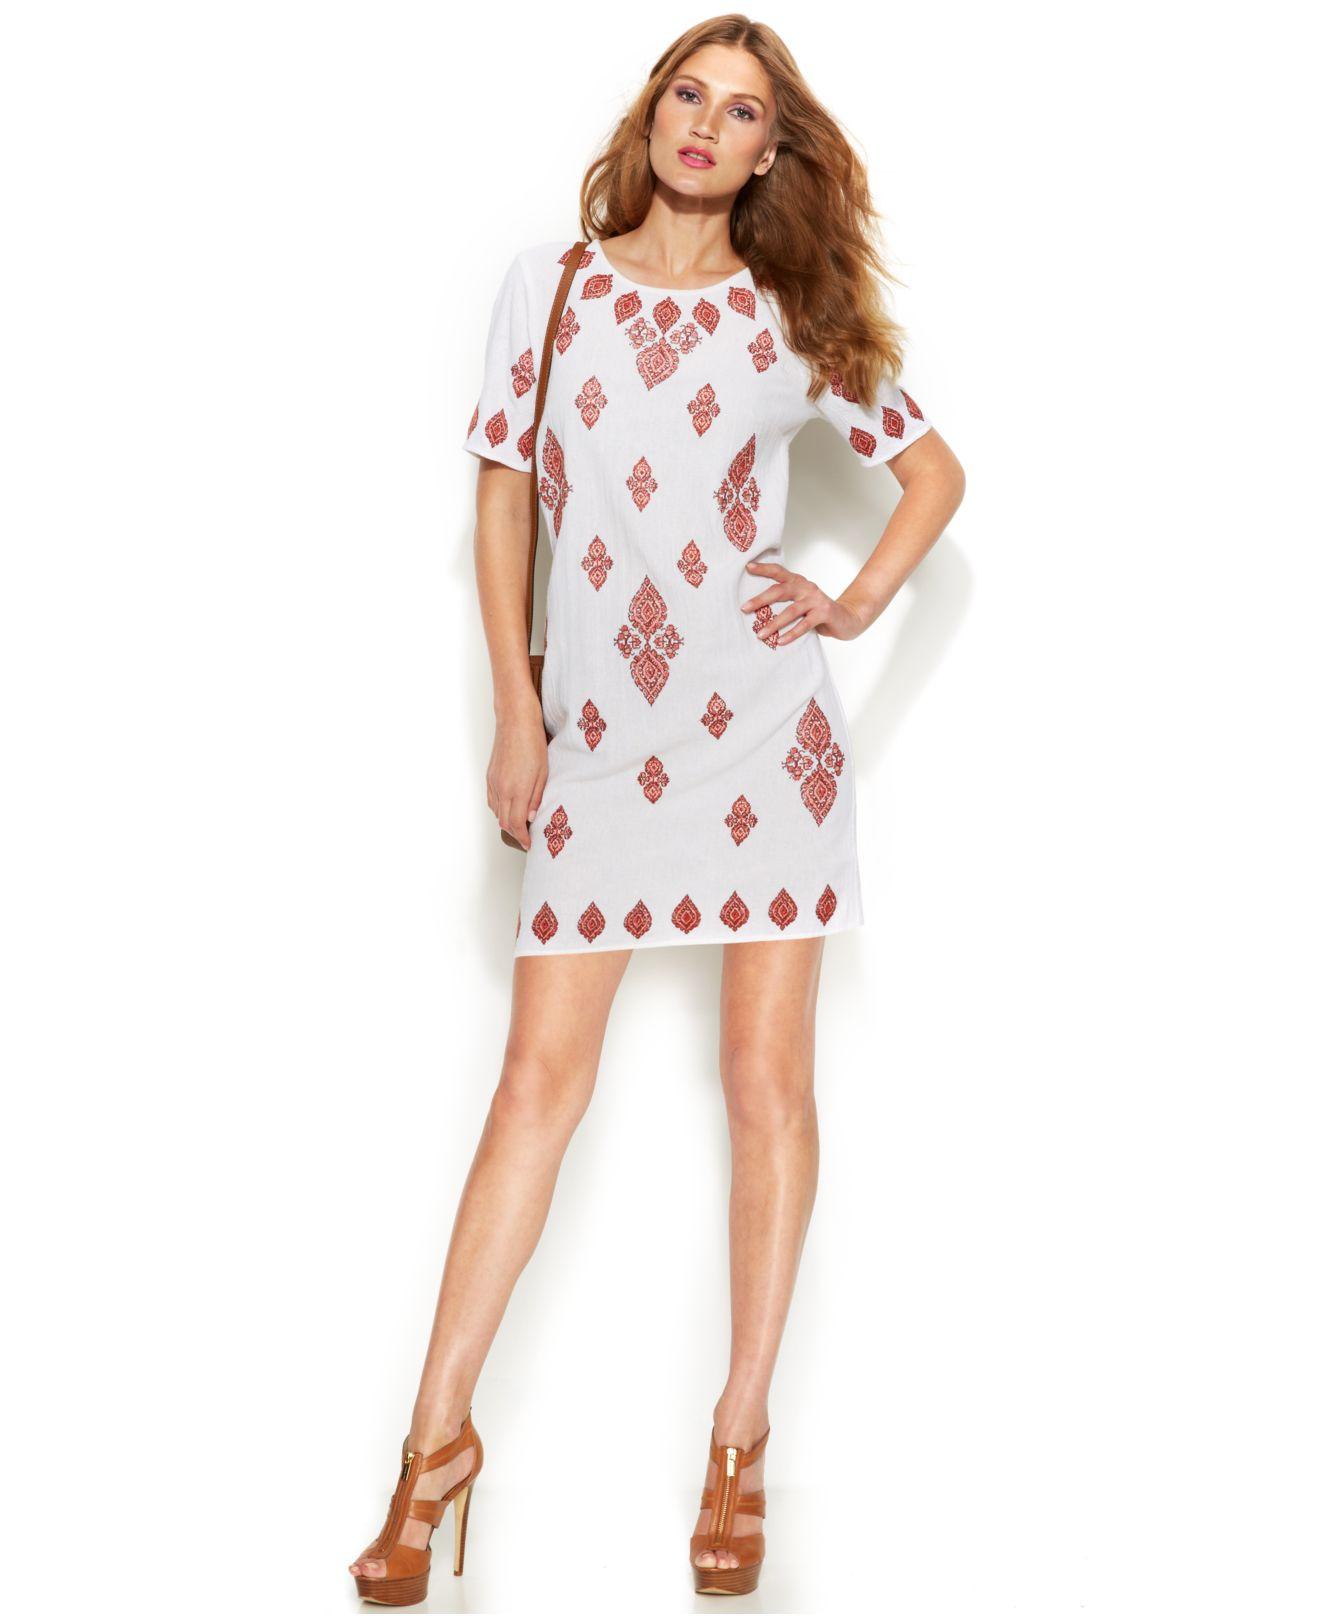 88133e0edecc Lyst - Michael Kors Michael Petite Paisley-Print Linen Dress in White